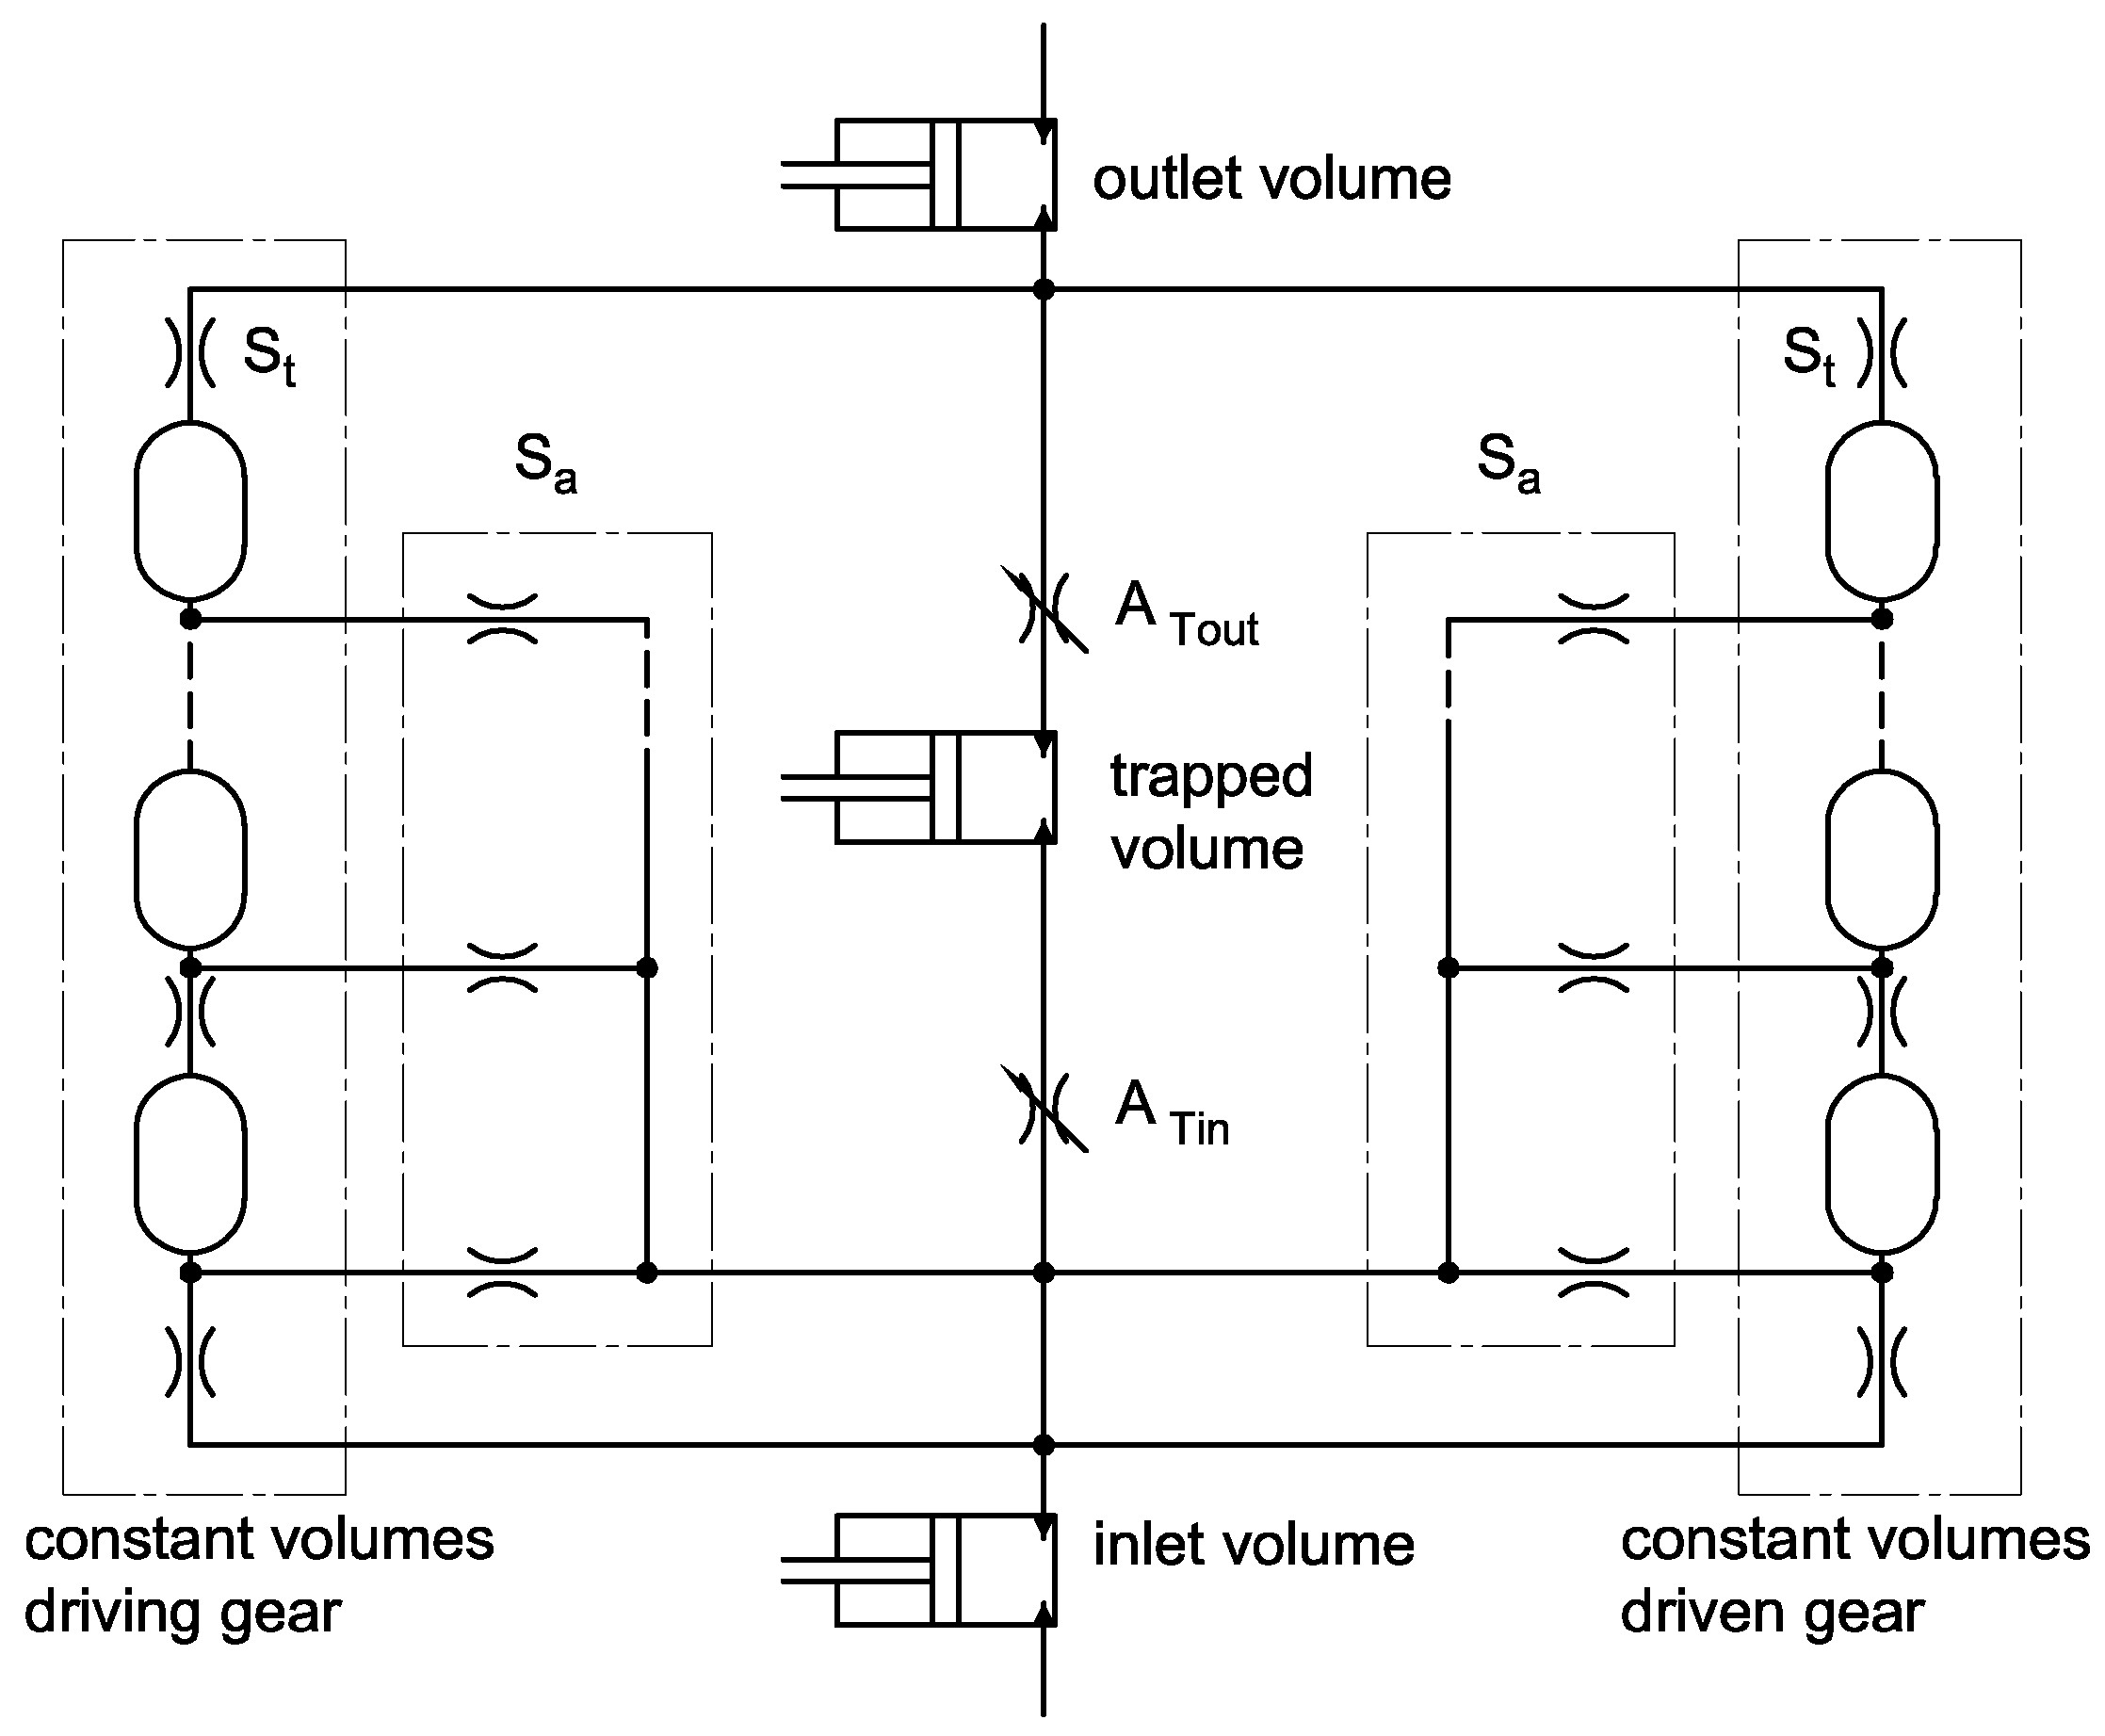 diagram of car gears energies free full text of diagram of car gears car  engine belt